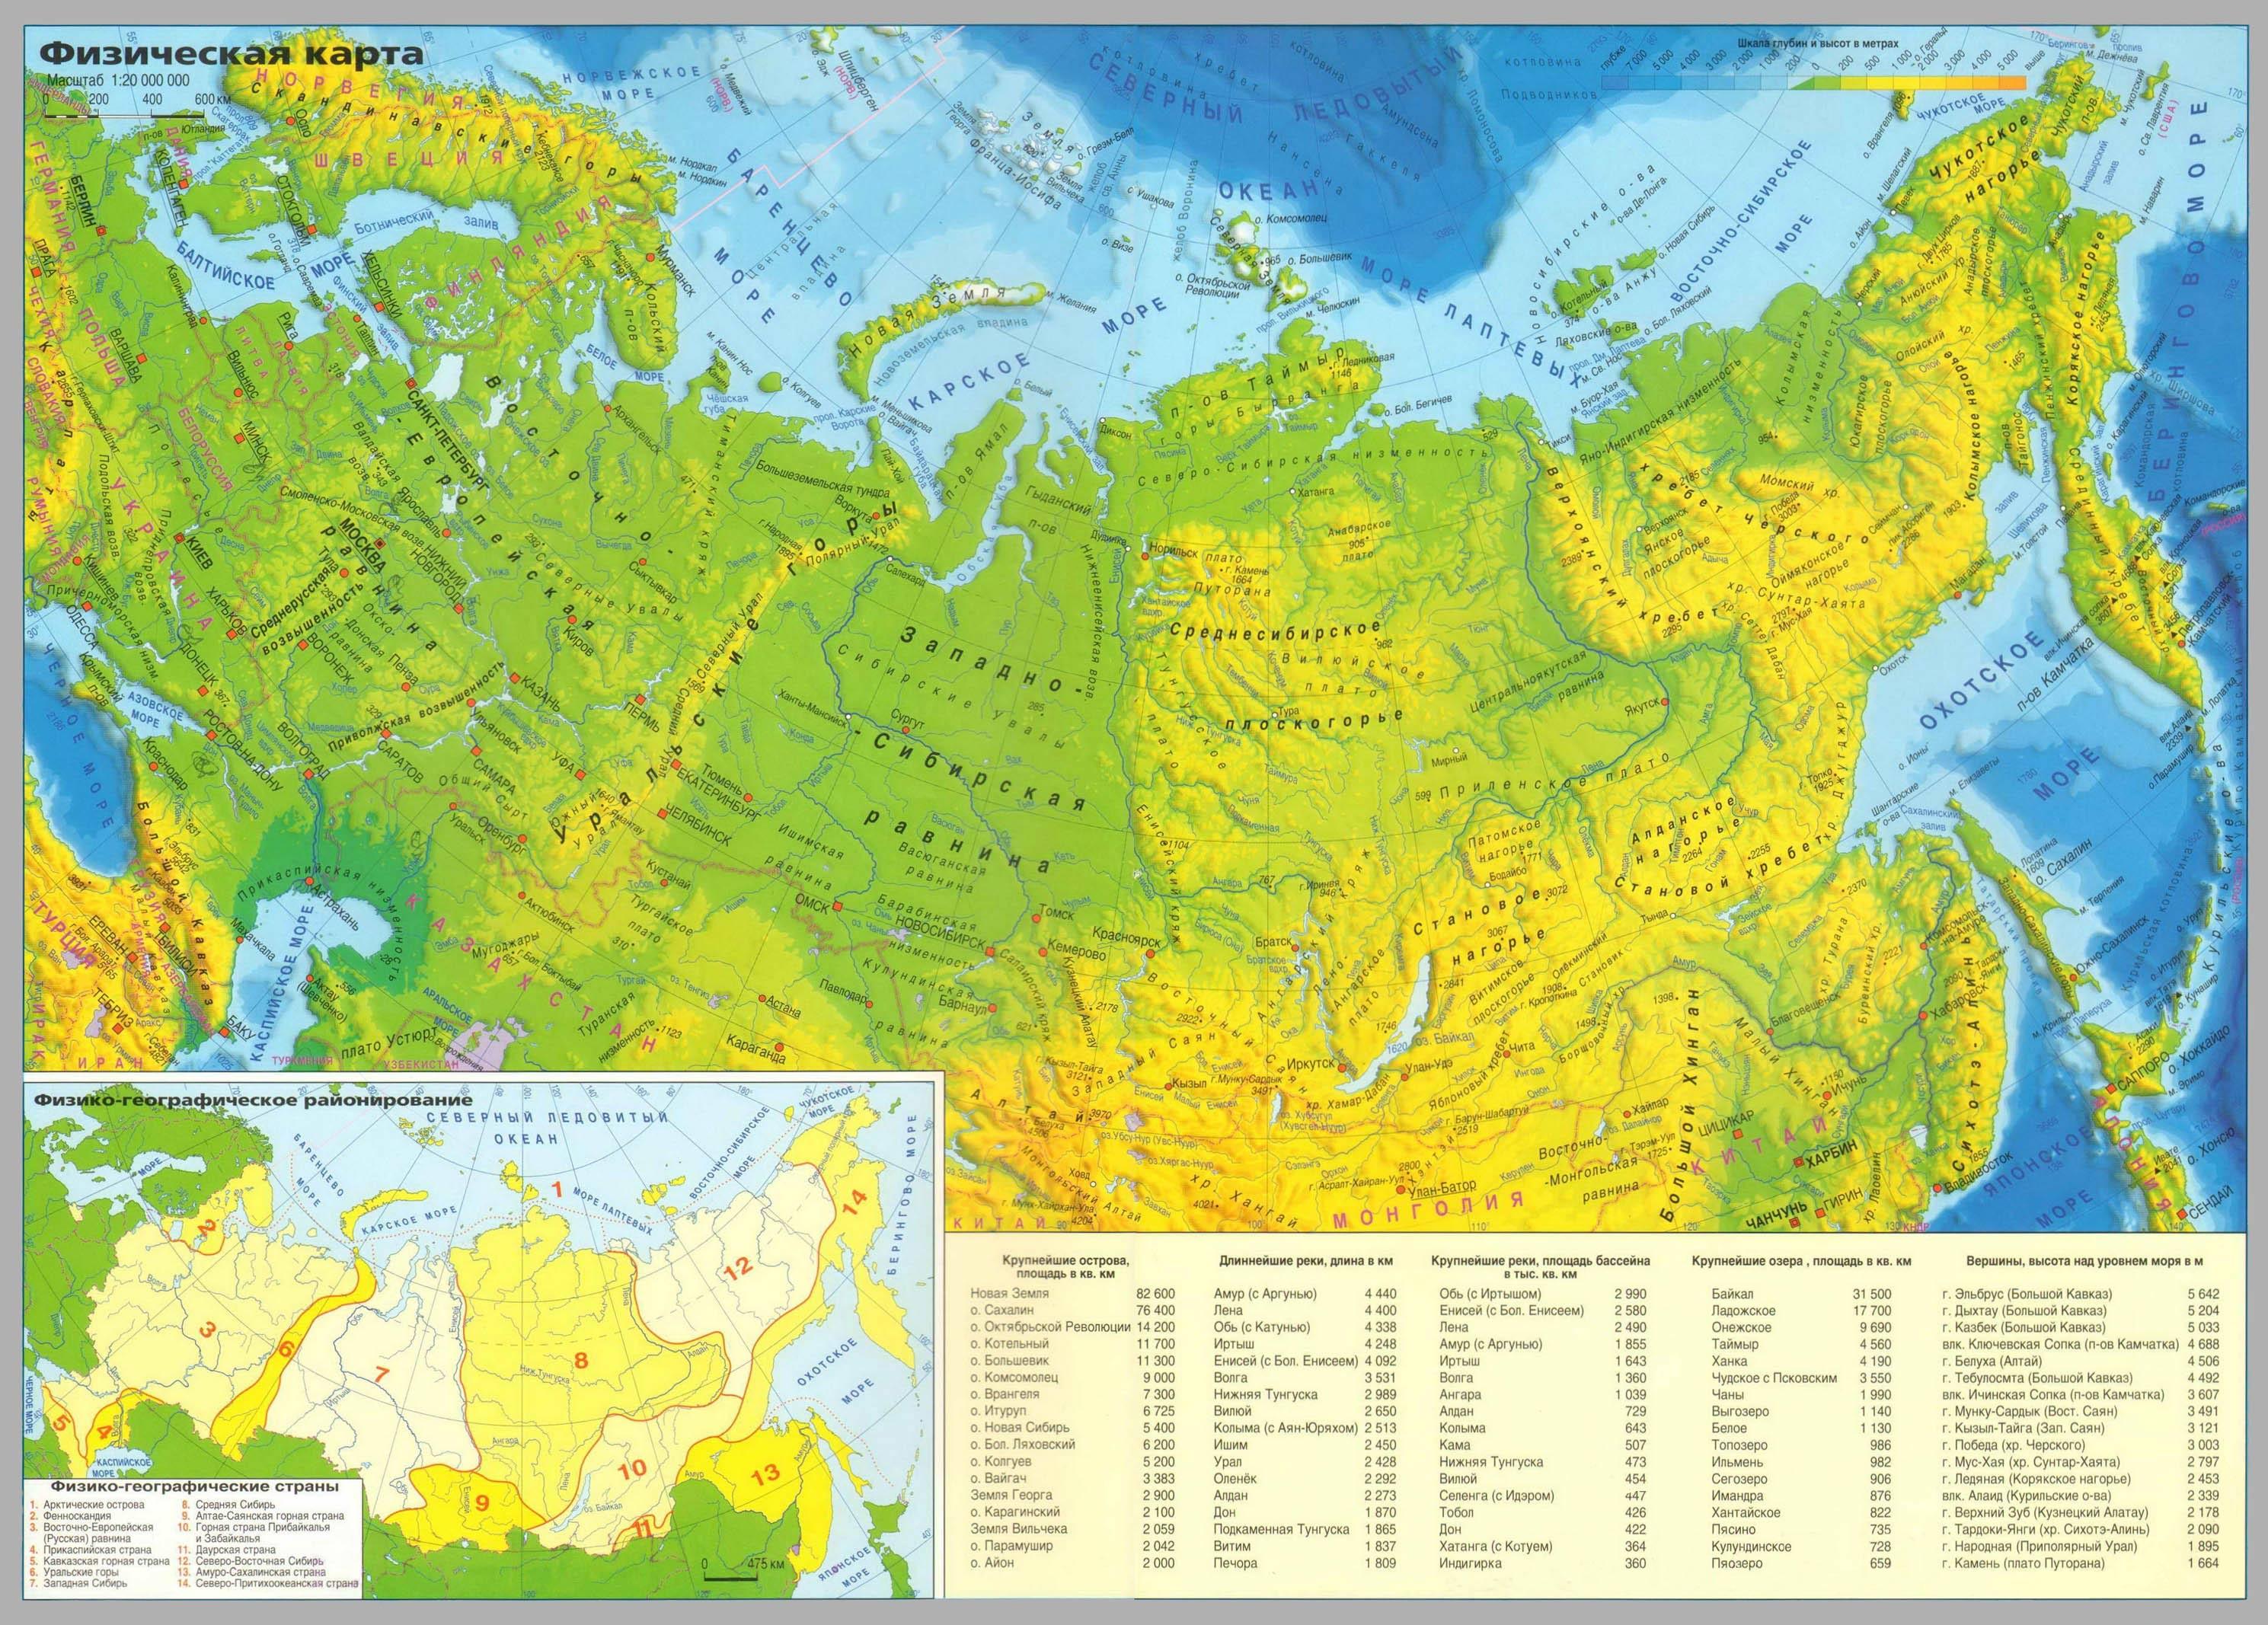 Карта России: https://geographyofrussia.com/karta-rossii/